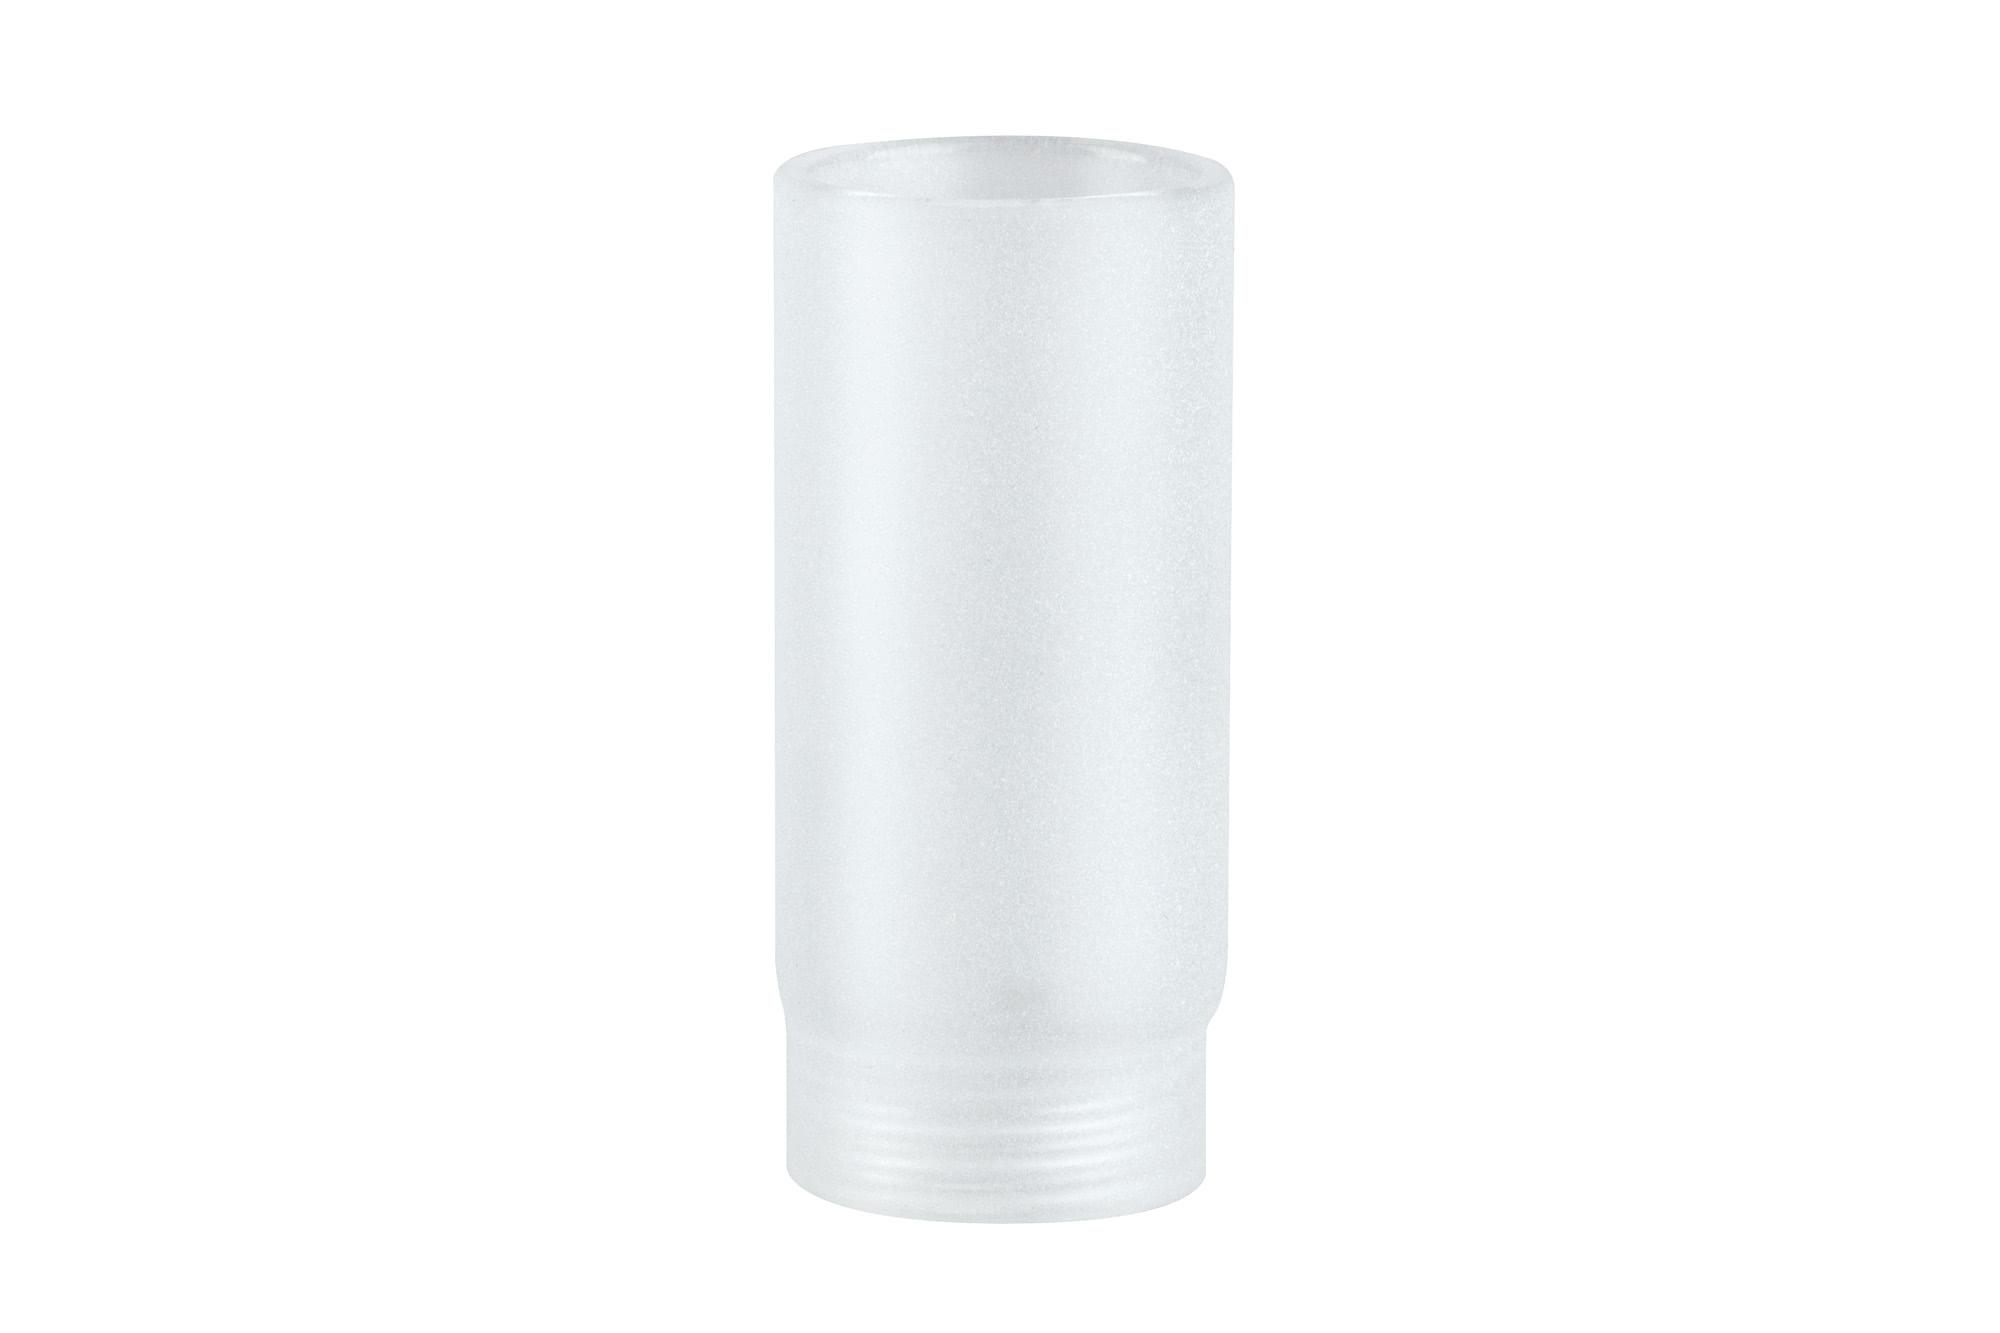 Paulmann. 87549 Glas Decopipe Minihalogen 60mm Satin